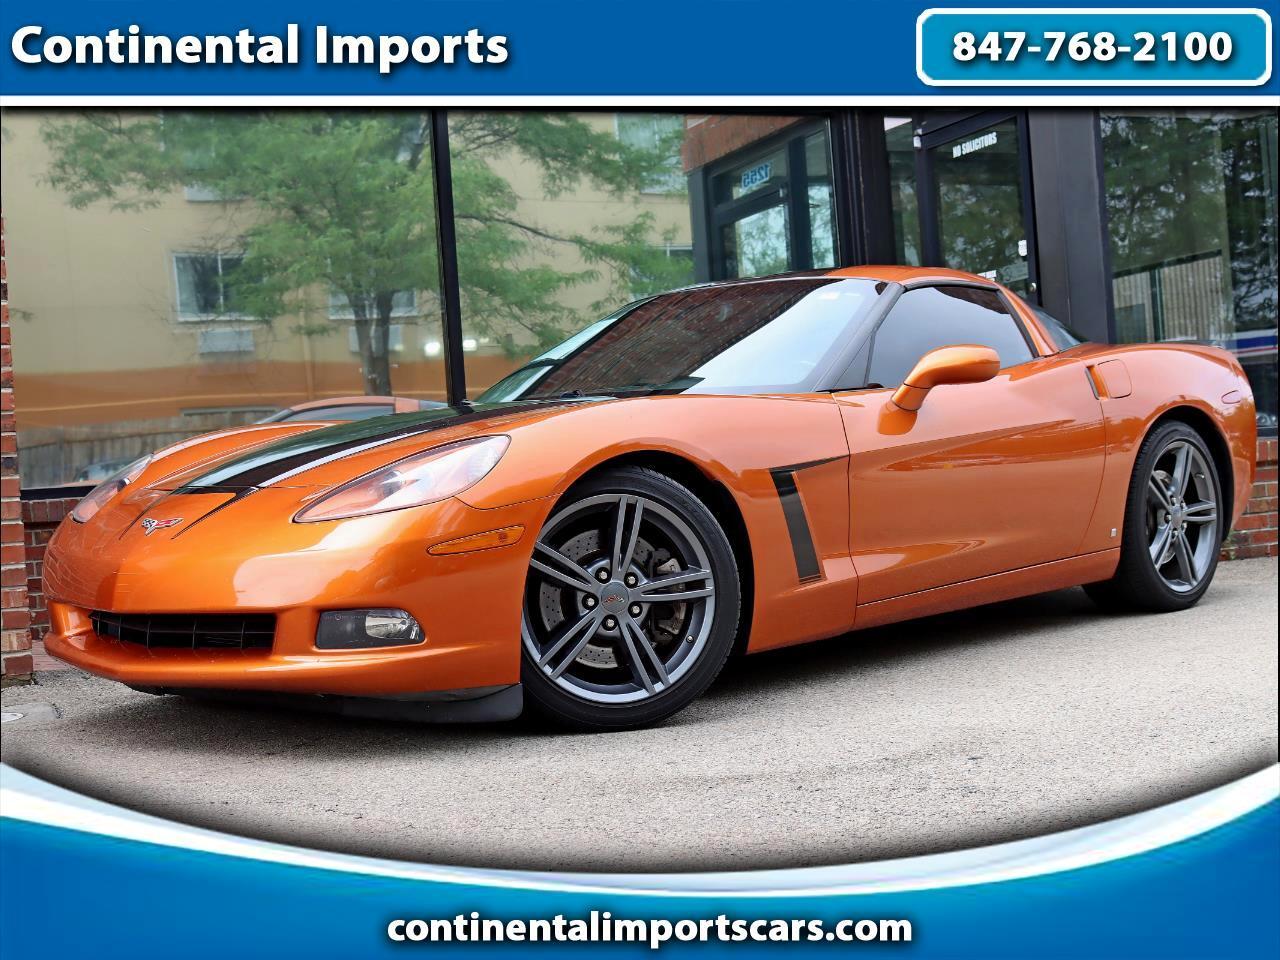 Chevrolet Corvette Coupe LT1 2008